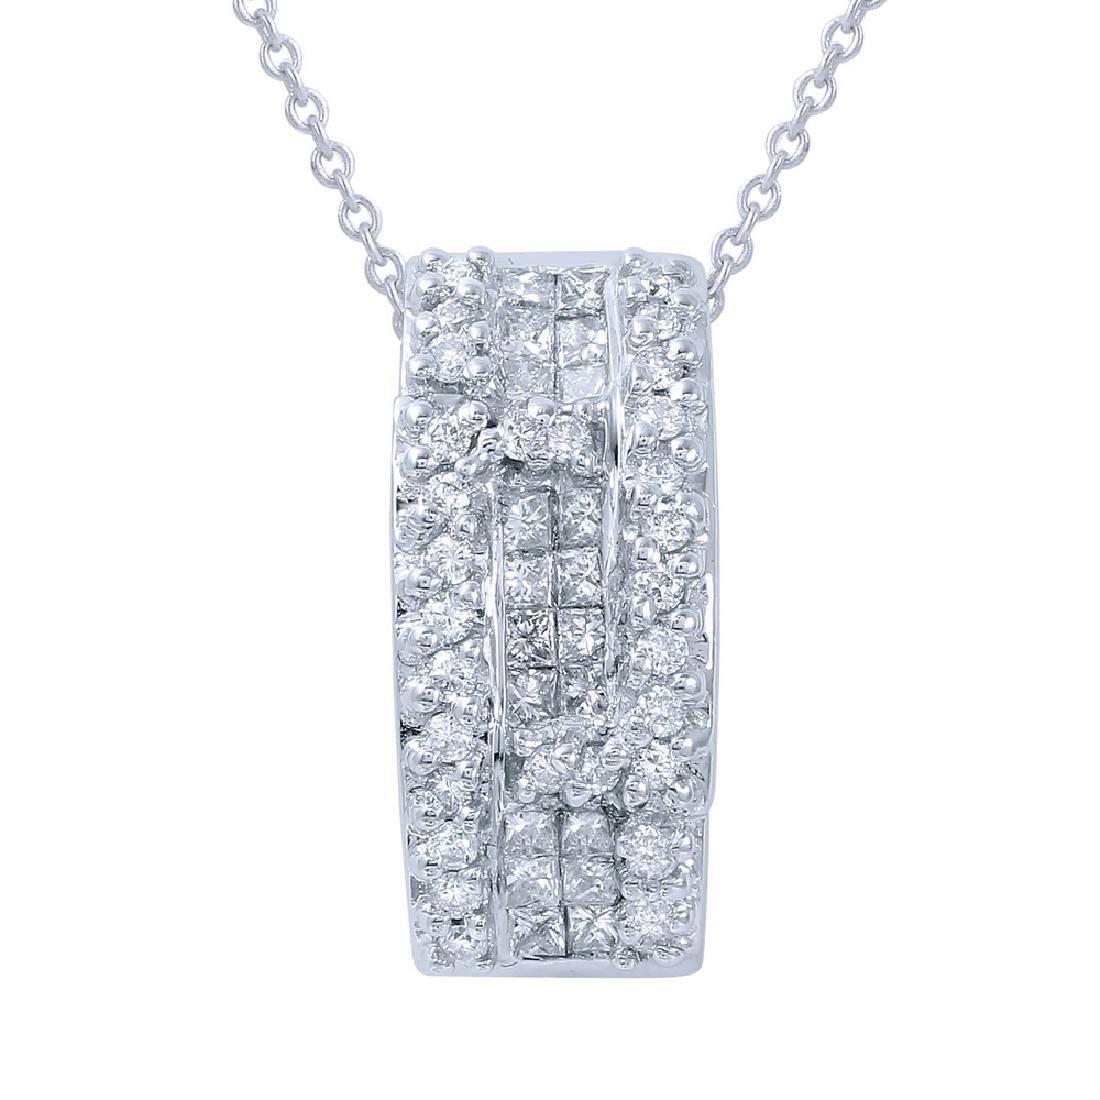 Genuine 1.3 TCW 14K White Gold Ladies Necklace